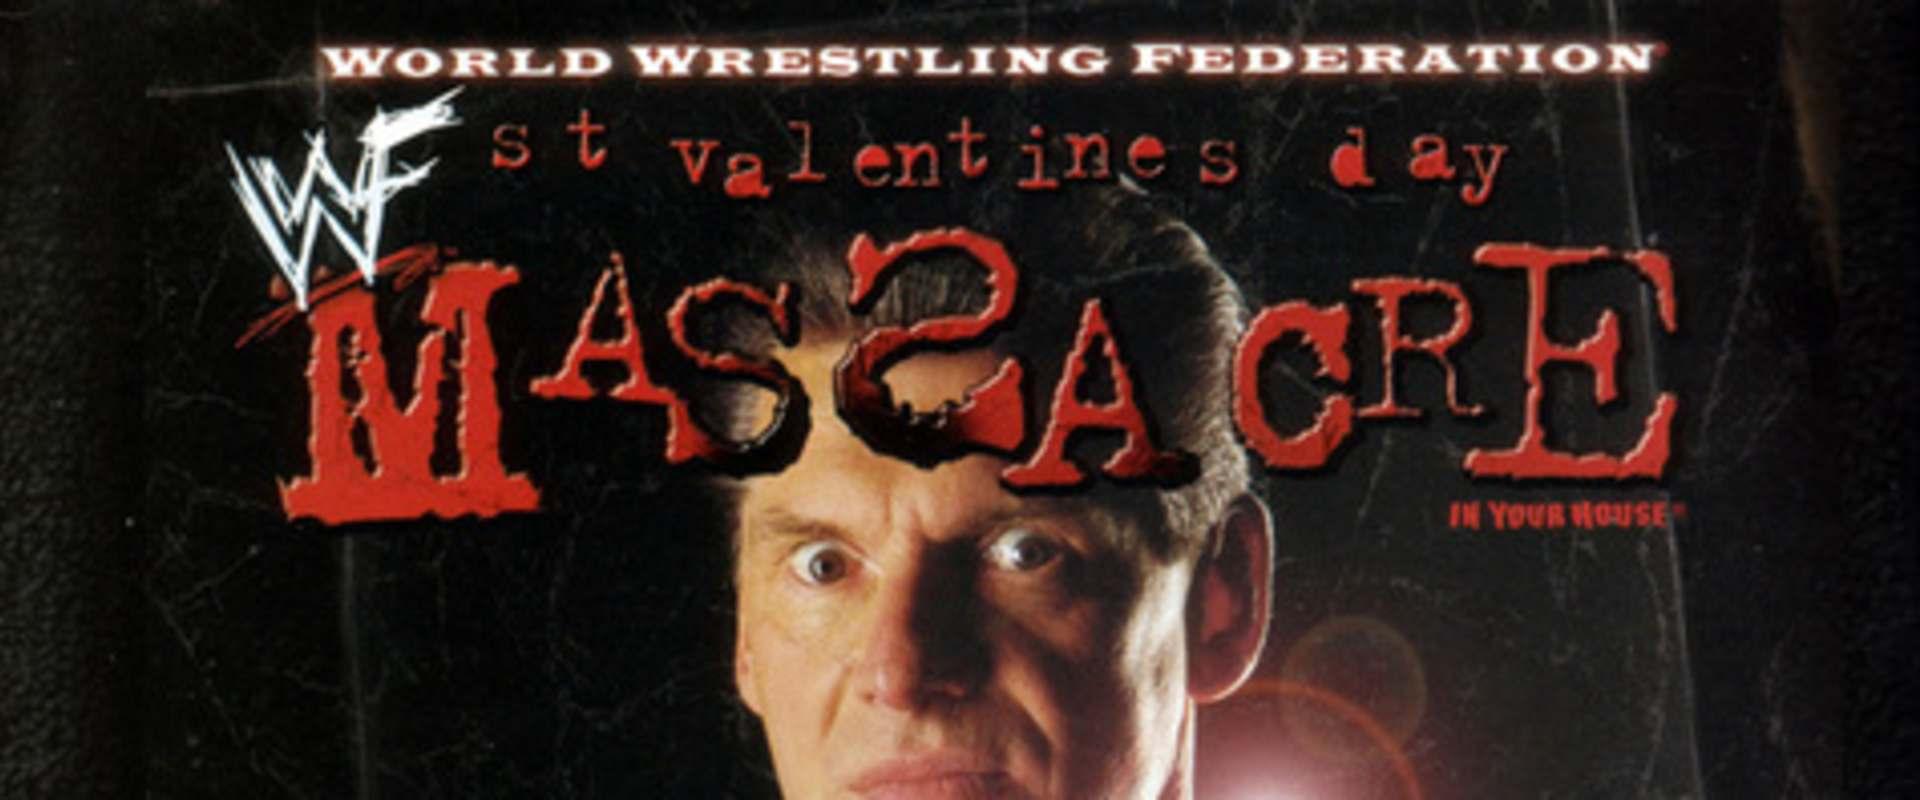 Watch Wwf St Valentine S Day Massacre On Netflix Today